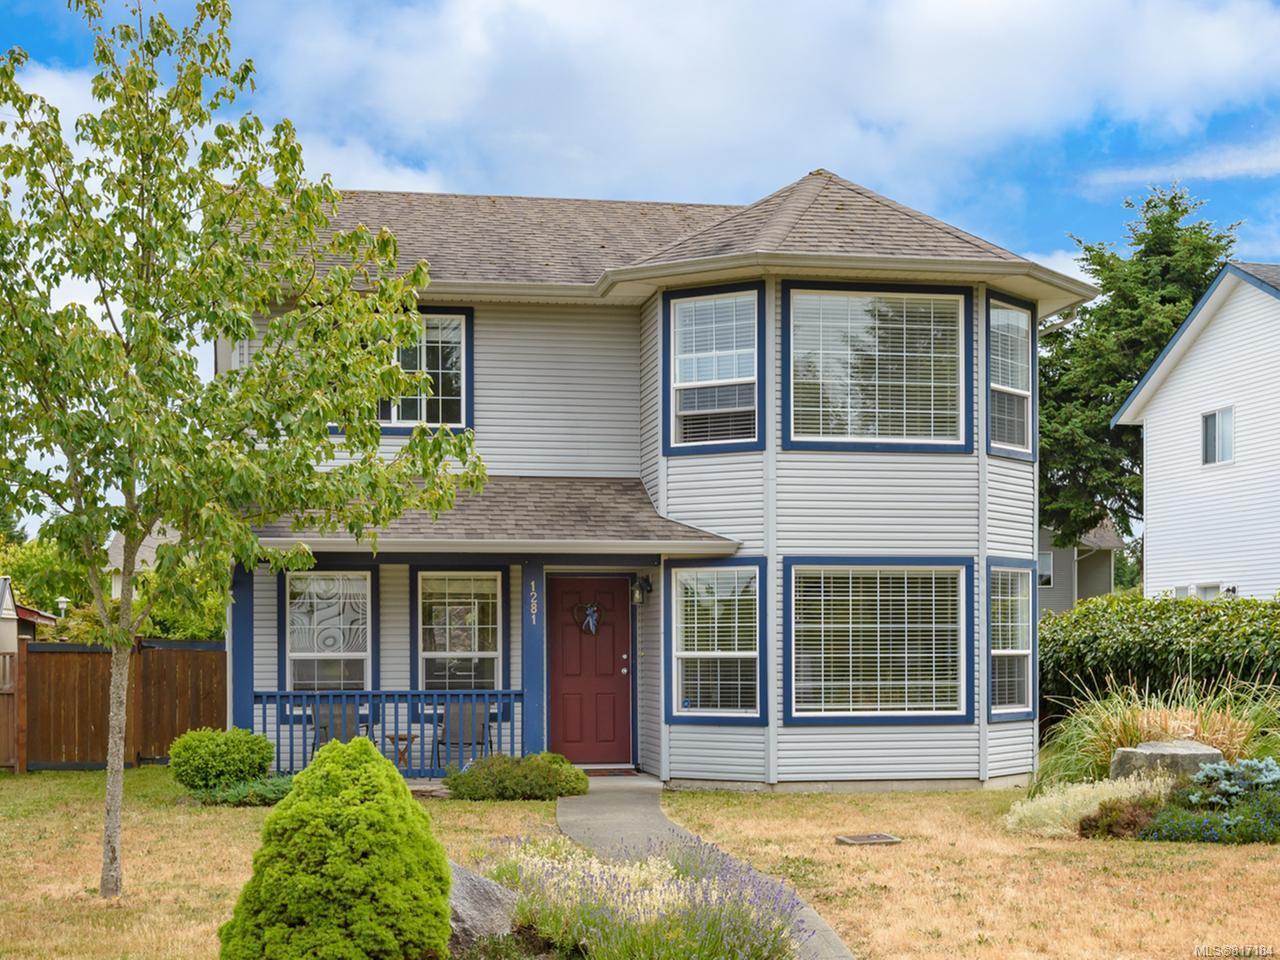 Main Photo: 1281 BECKTON DRIVE in COMOX: CV Comox (Town of) House for sale (Comox Valley)  : MLS®# 817184